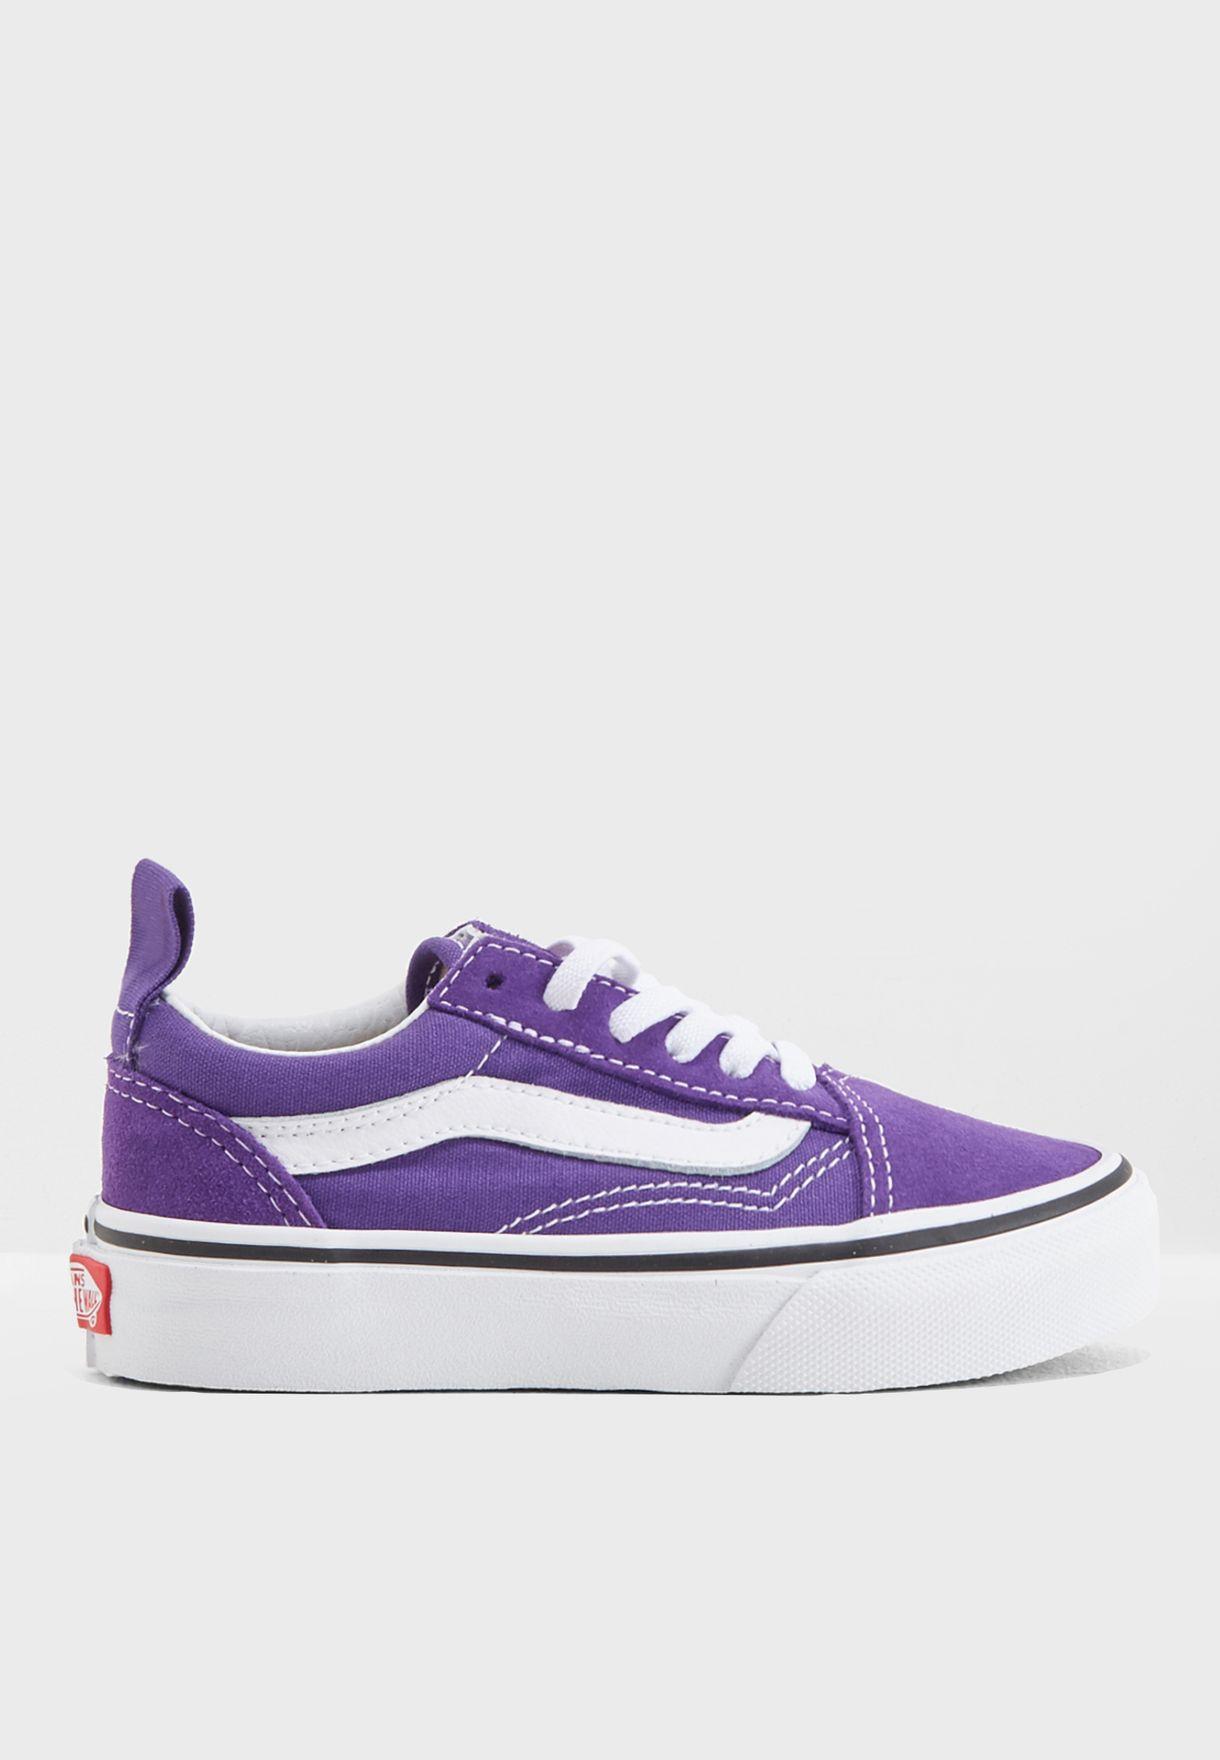 108bd83c3e Shop Vans purple Youth UY Old Skool Elastic Lace QPG4ME for Kids in ...